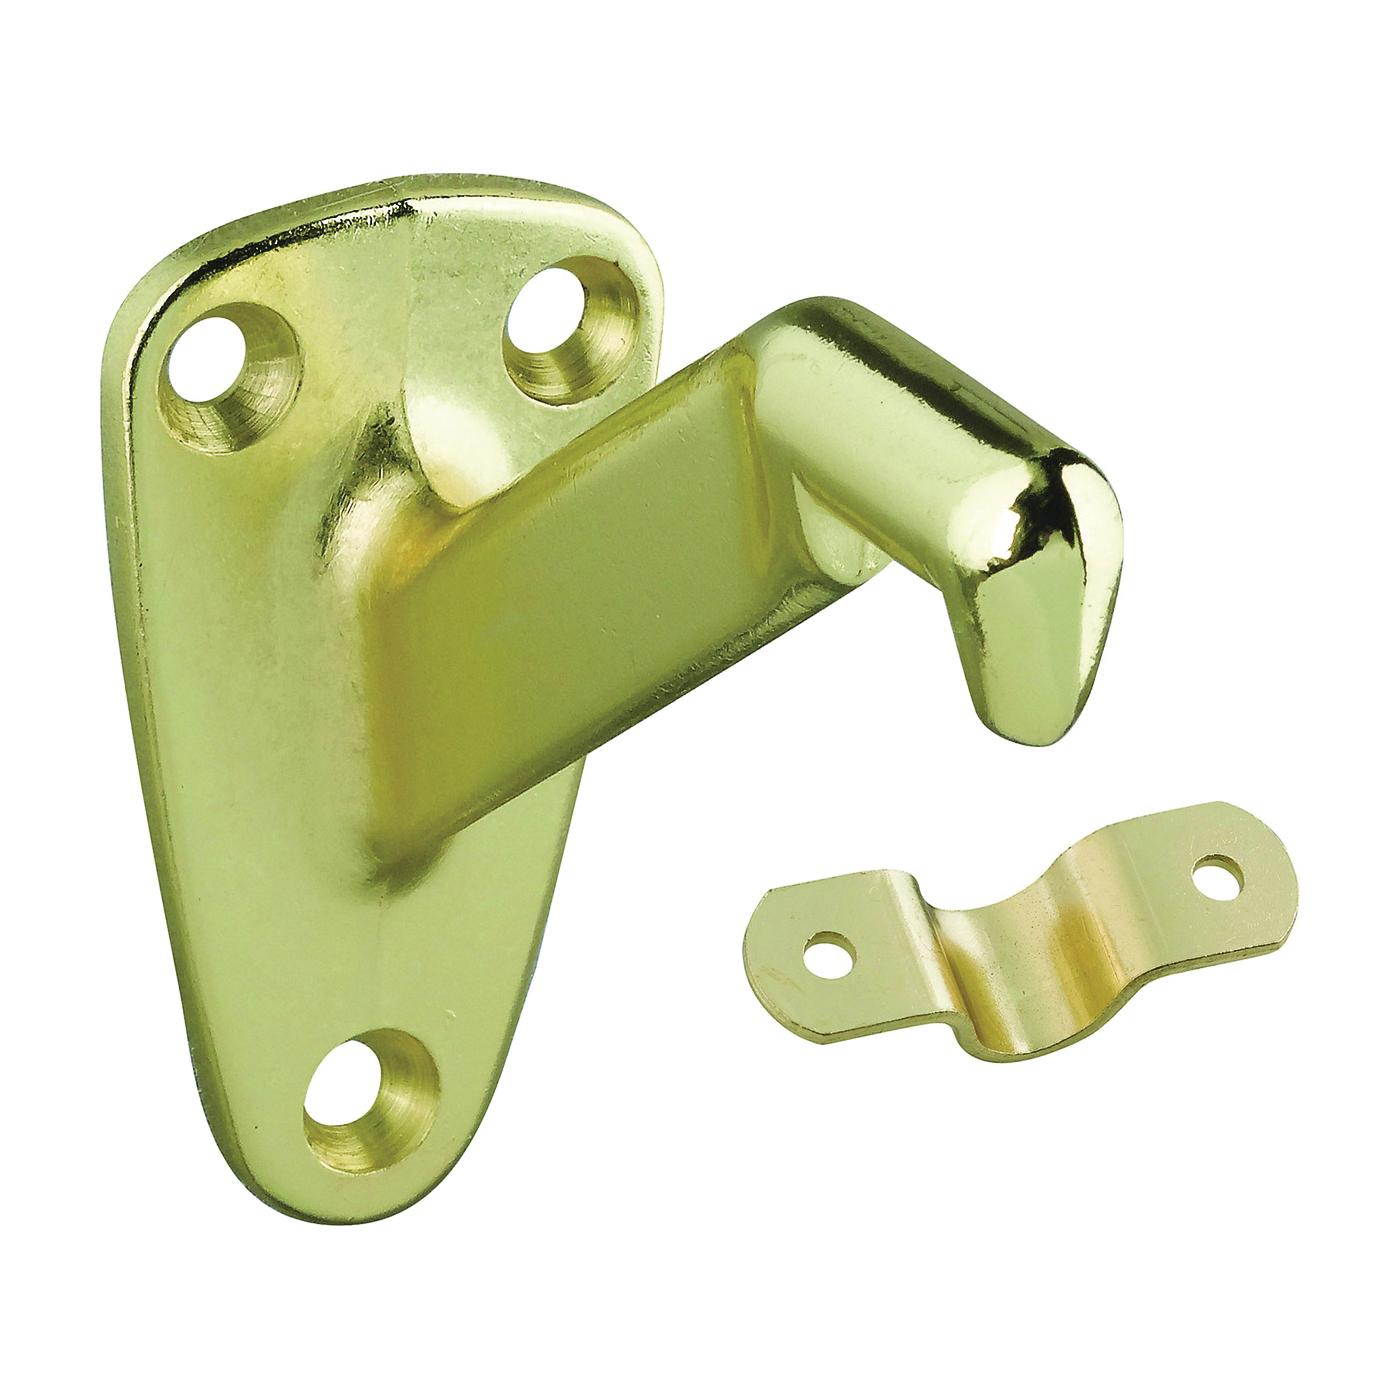 Picture of National Hardware N830-116 Handrail Bracket, 250 lb, Zinc, Polished Brass